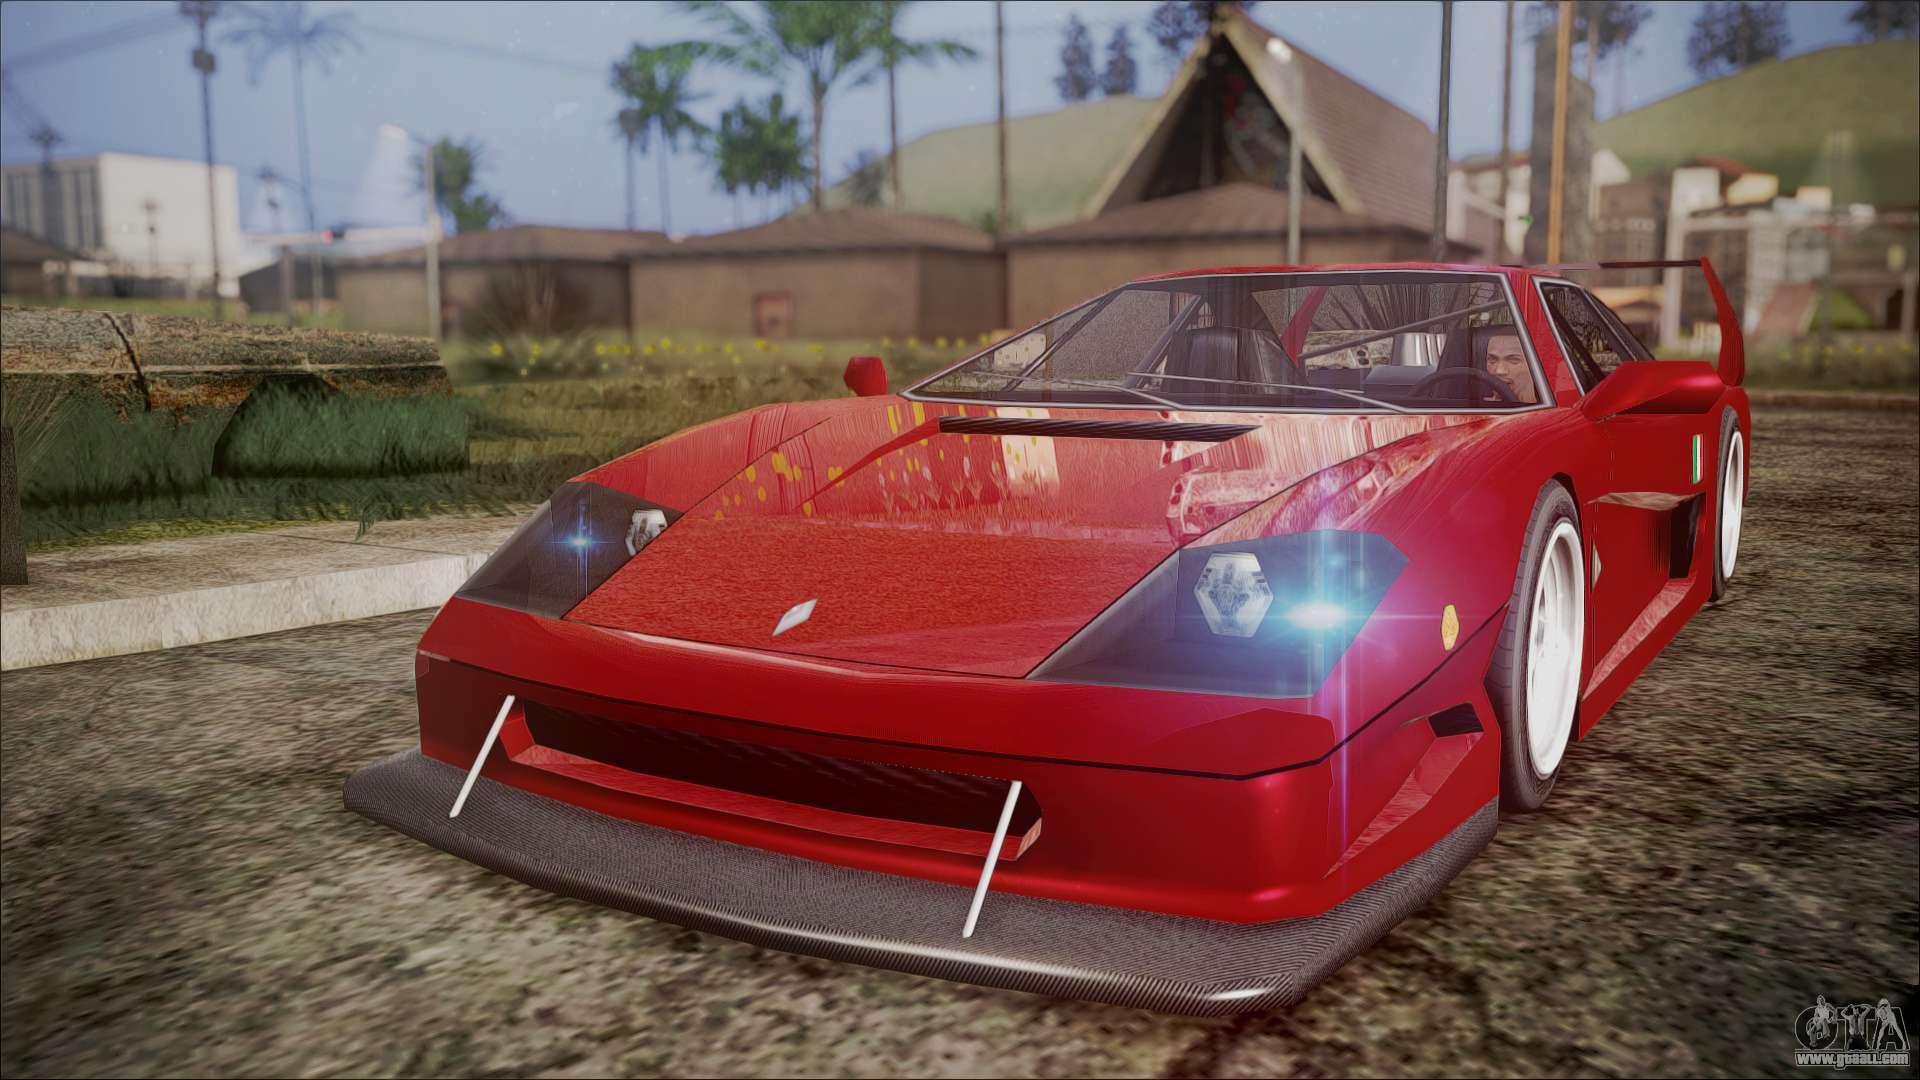 Turismo F40 for GTA San Andreas